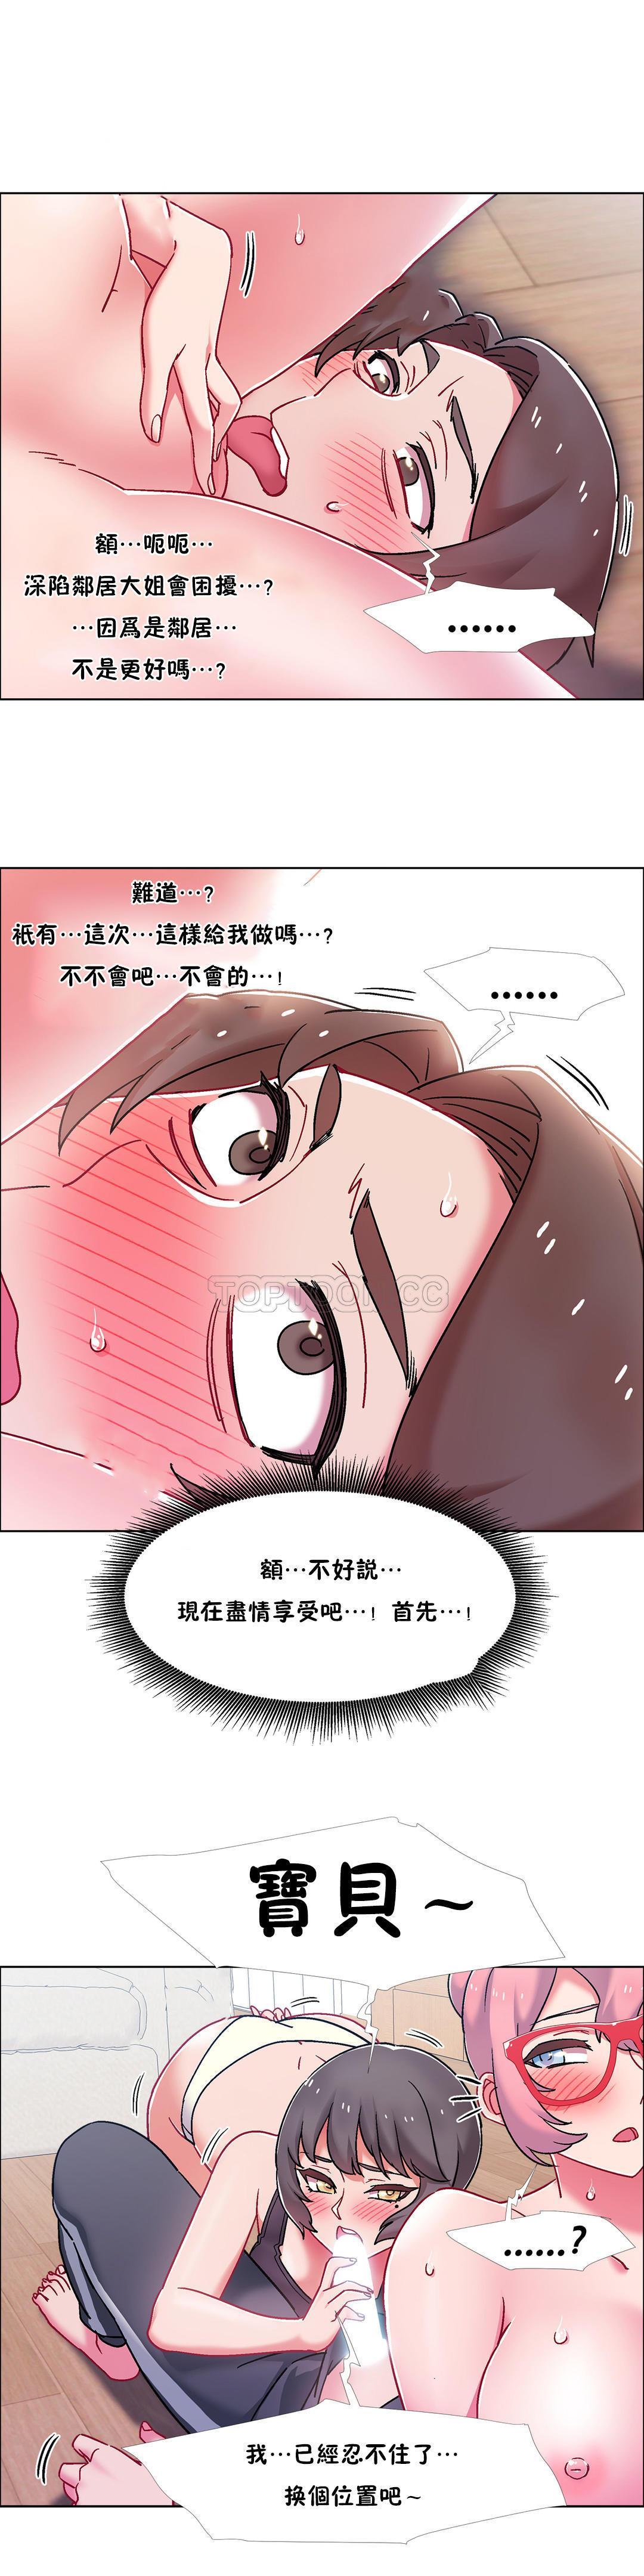 [Studio Wannabe] Rental Girls | 出租女郎 Ch. 33-58 [Chinese]  第二季 完结 361